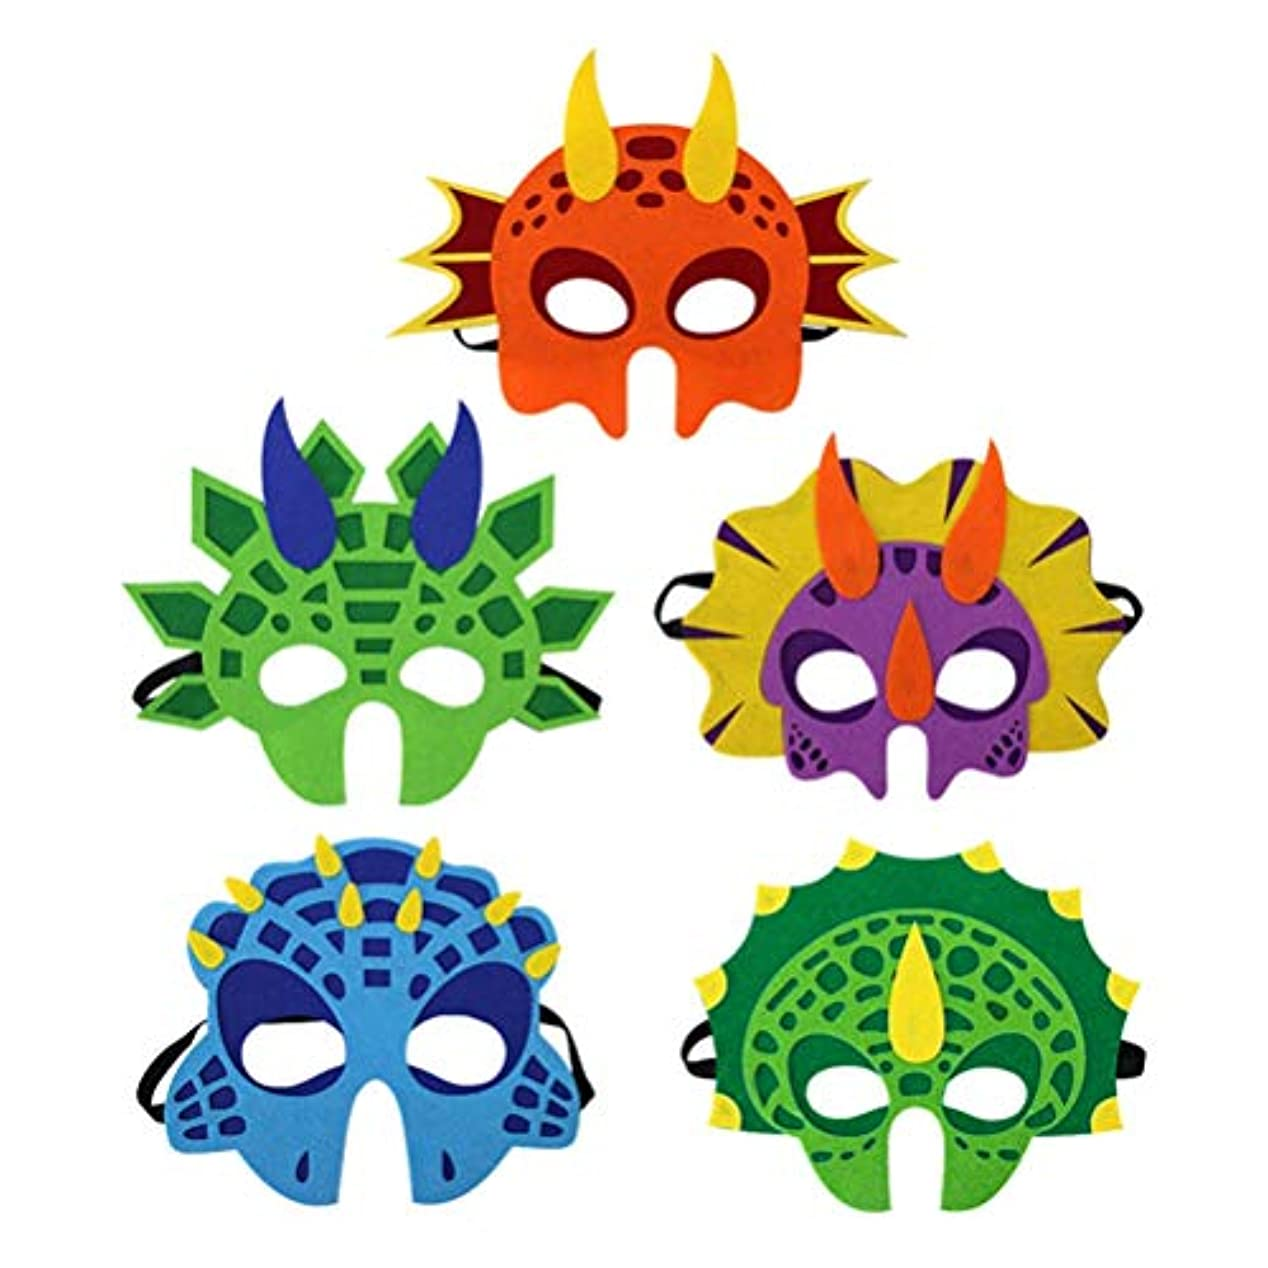 BESTOYARD 5ピース恐竜マスクコスプレフェルトマスクかわいい恐竜漫画フェイスマスク用子供キッズパーティー用品